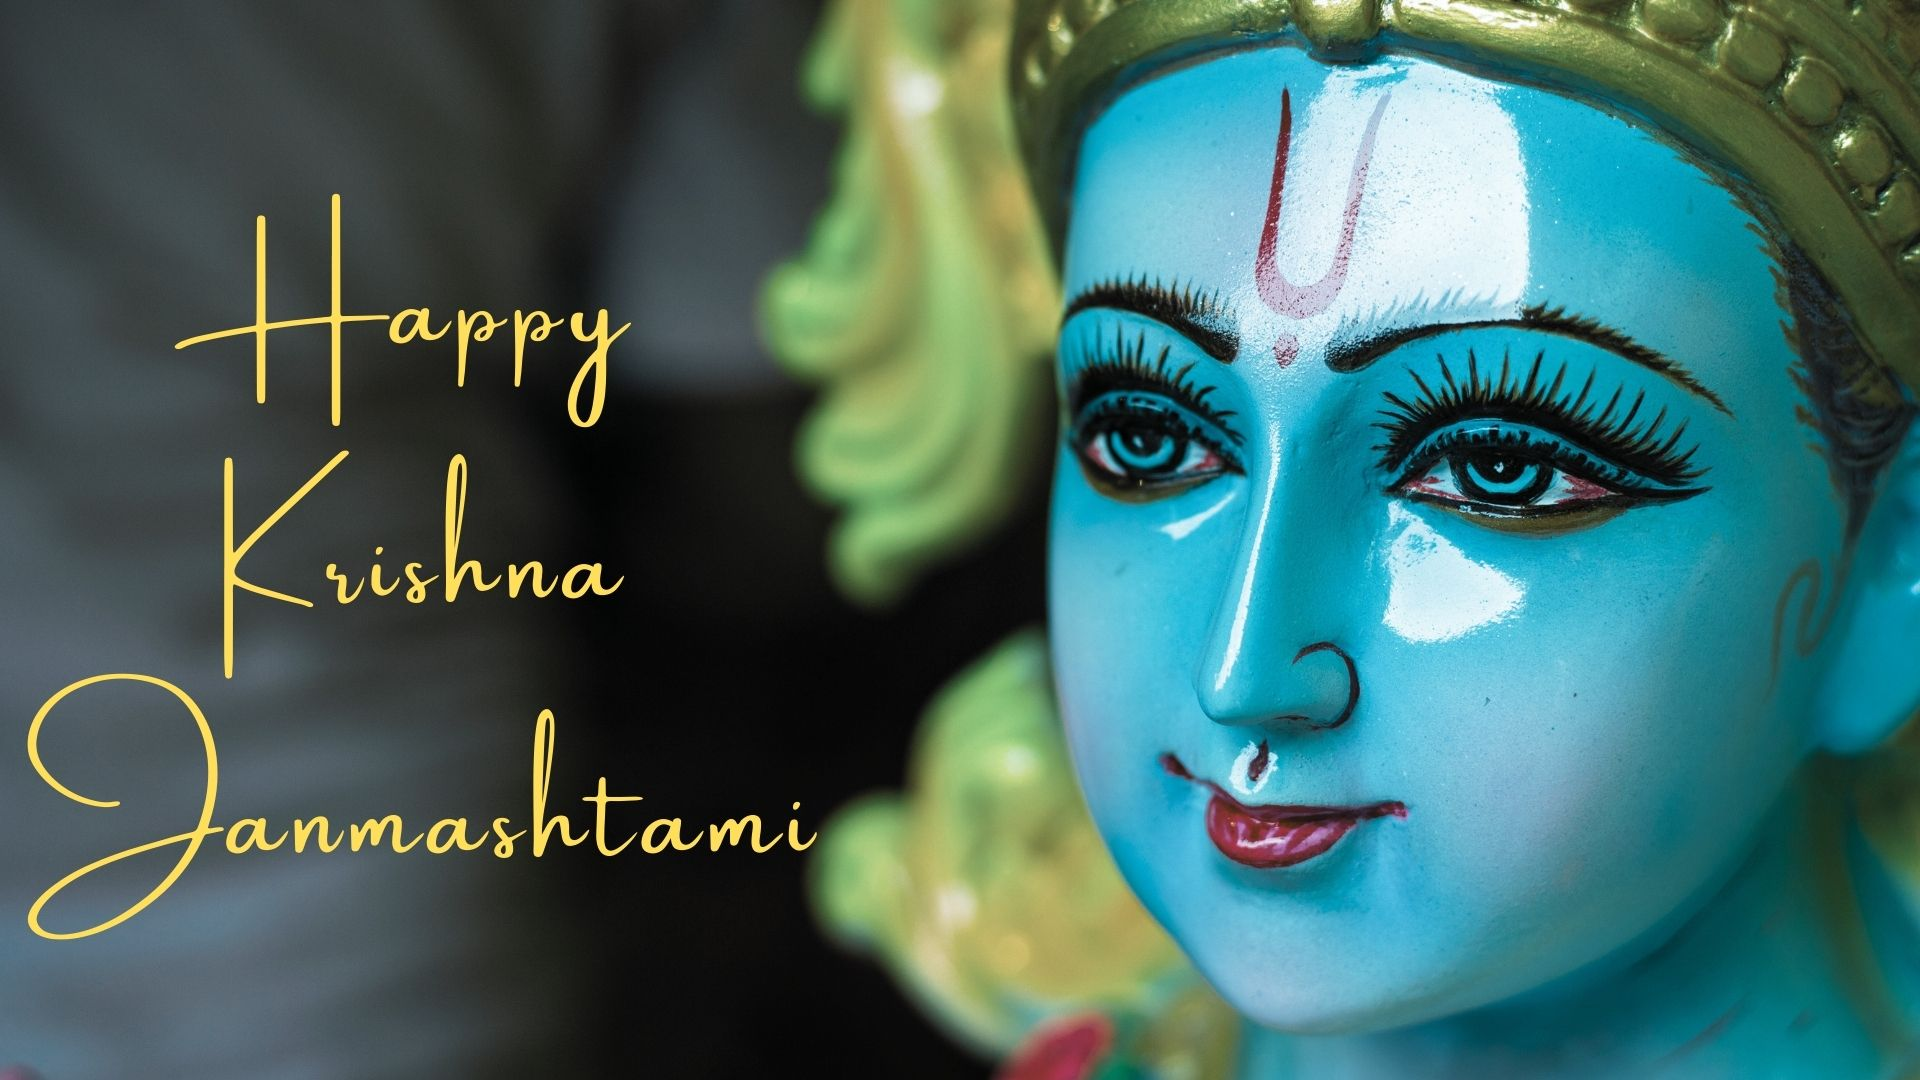 happy krishna janmashtami wishes image